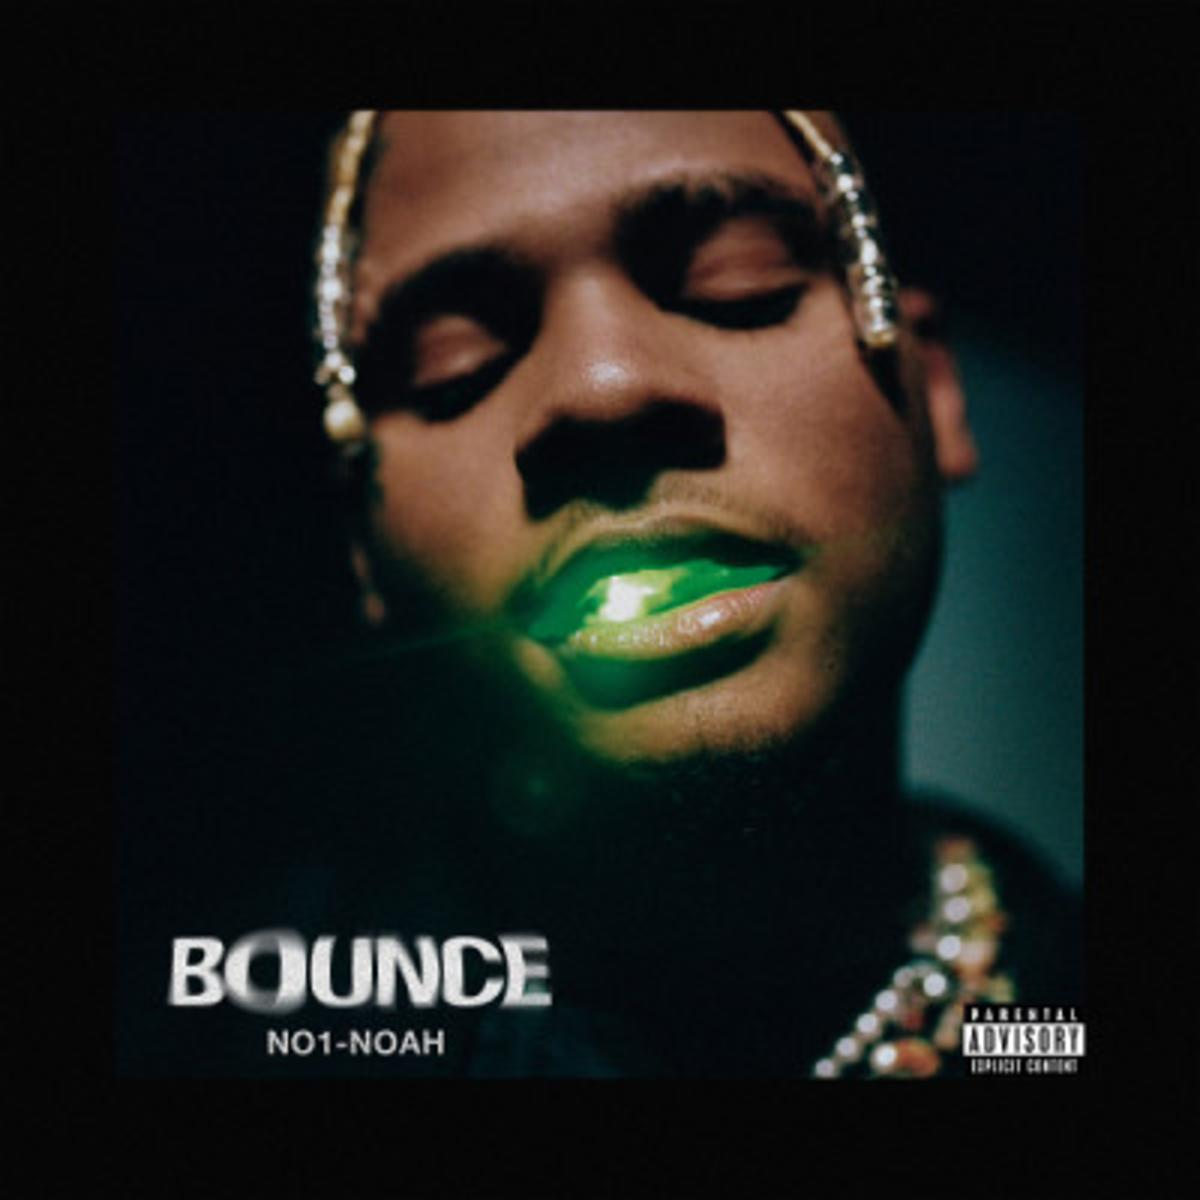 MP3: NO1-NOAH - Bounce